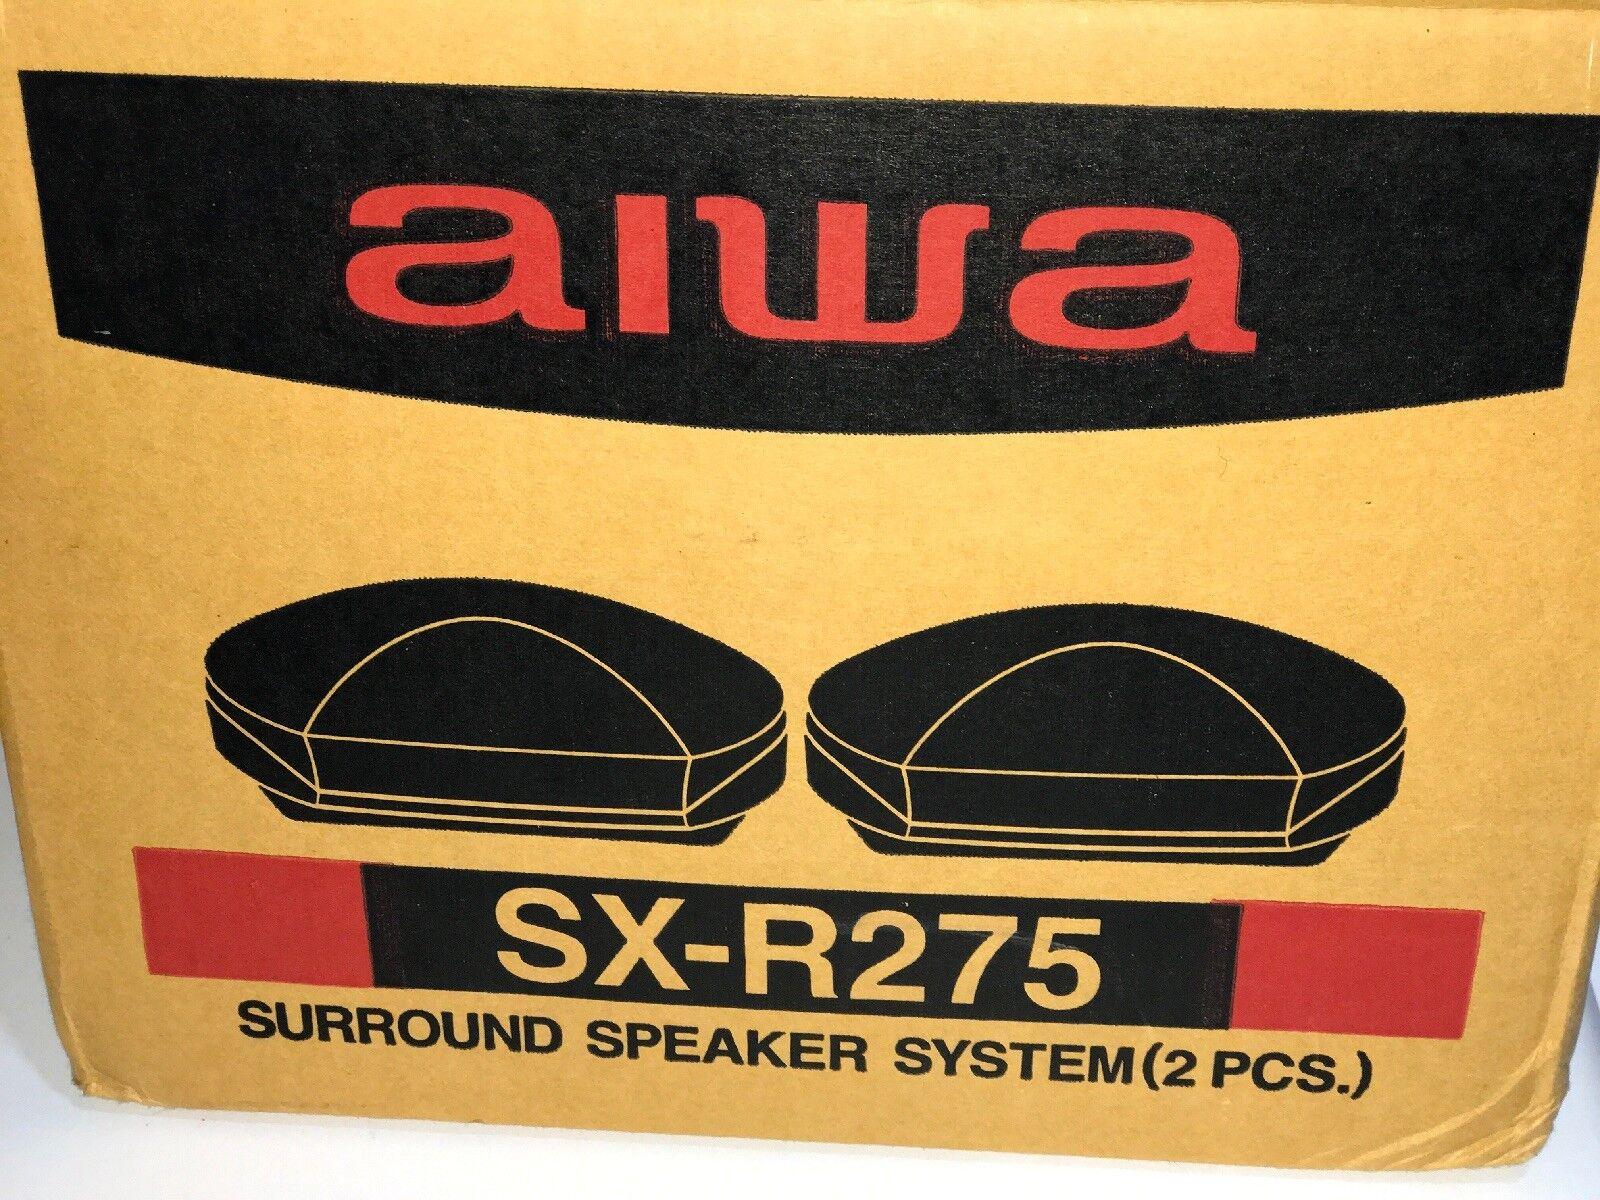 Aiwa Sx-r275 In The Box